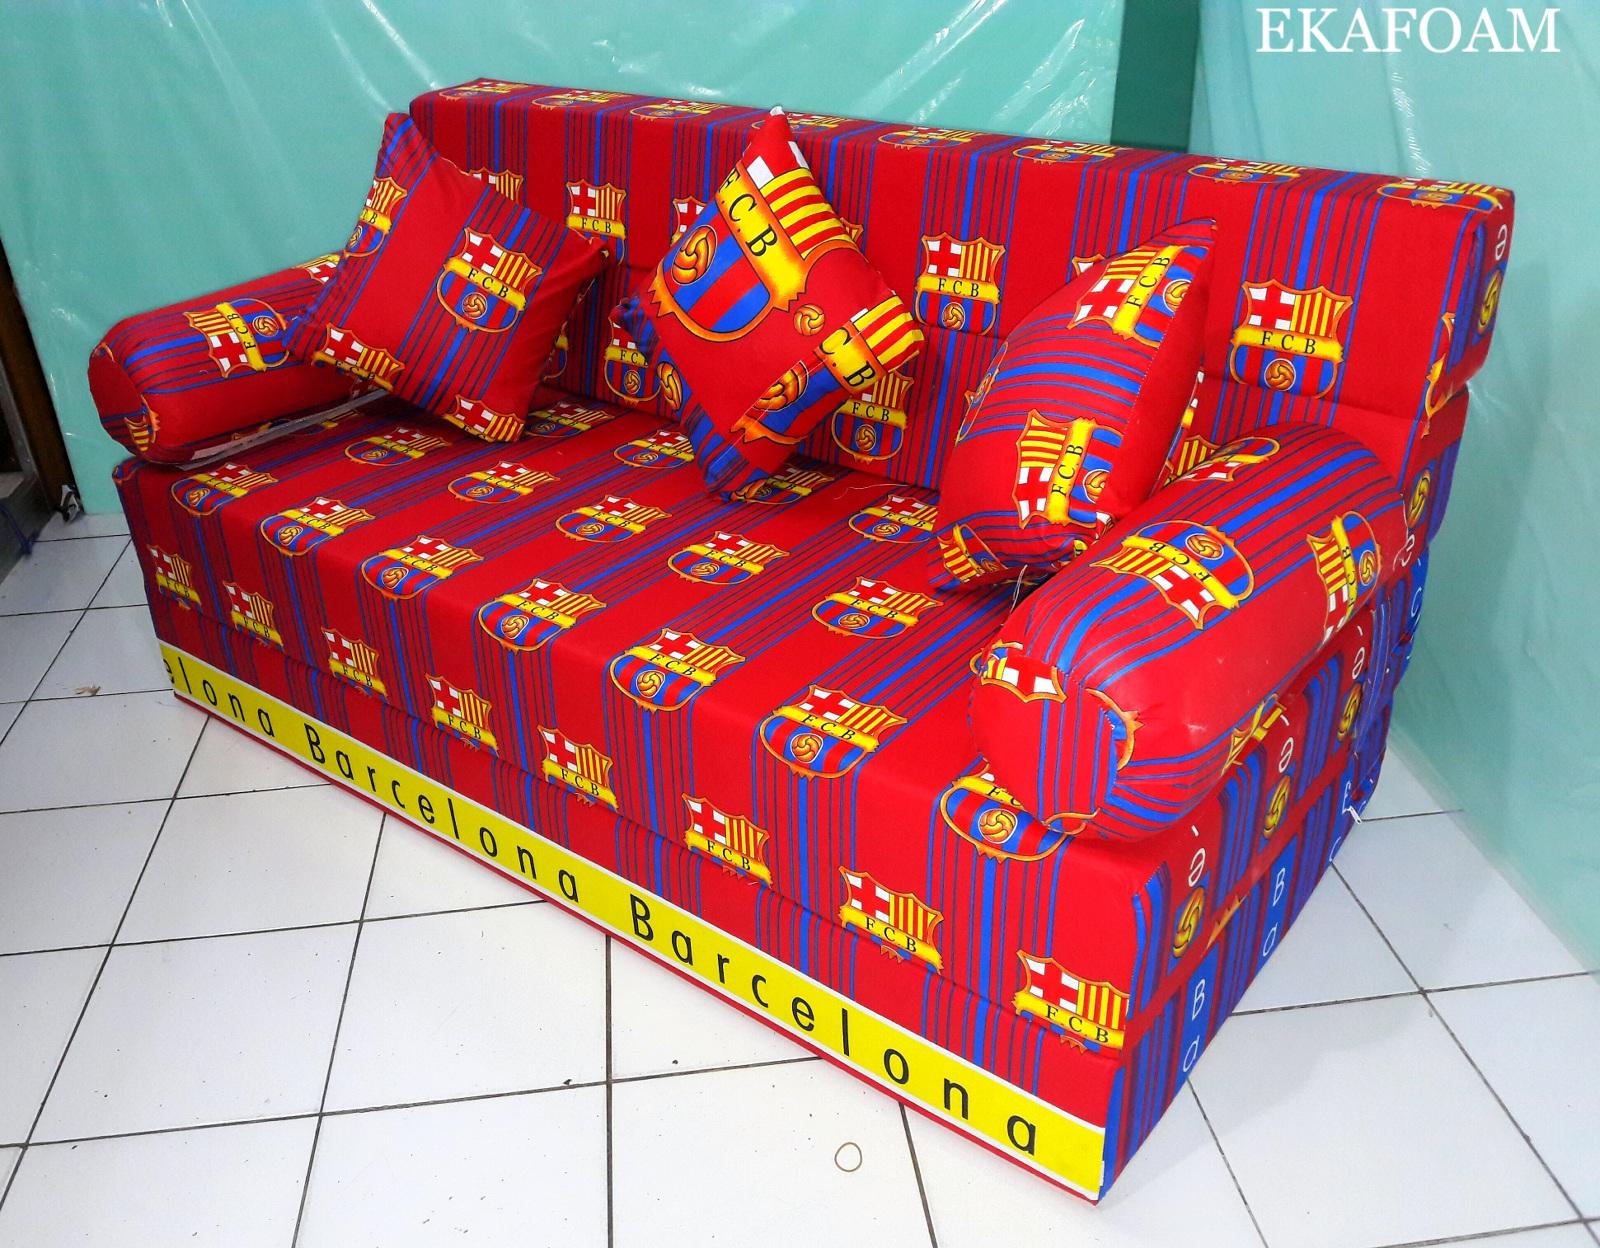 harga sofa bed inoac 2017 ava homebase full motif agen resmi kasur busa